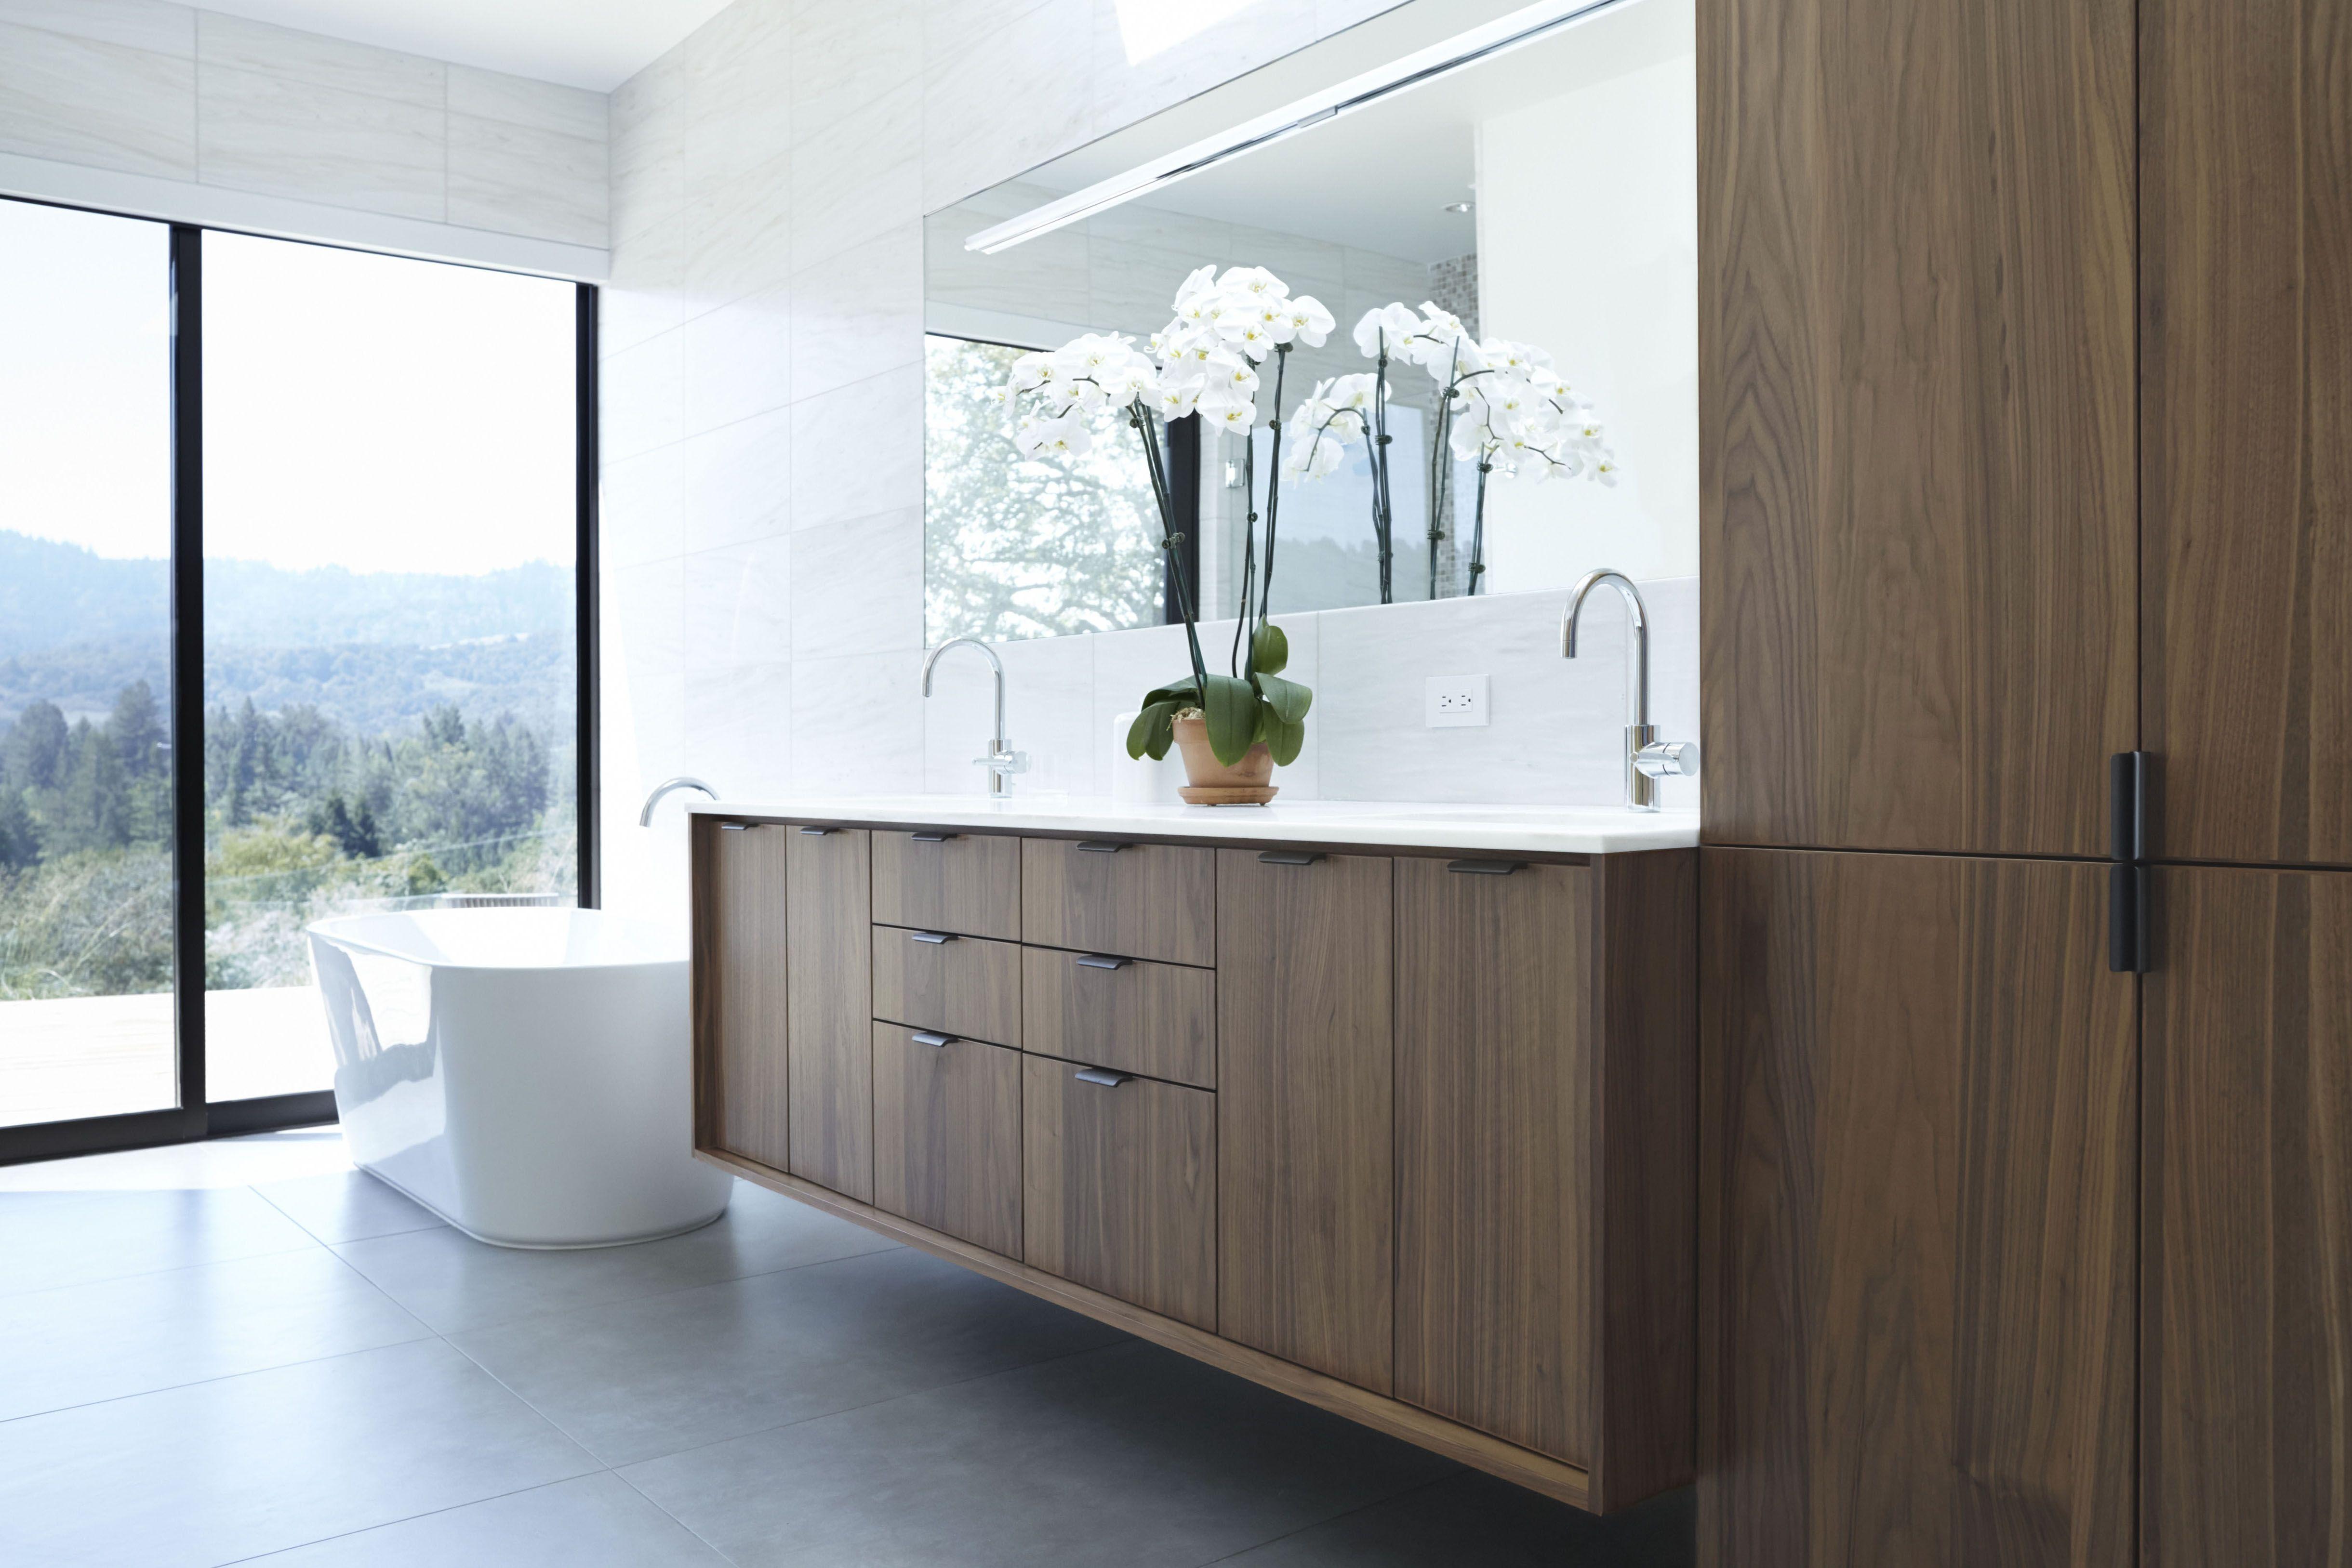 Henrybuilt Does Bathroom Bathrooms Pinterest Flats